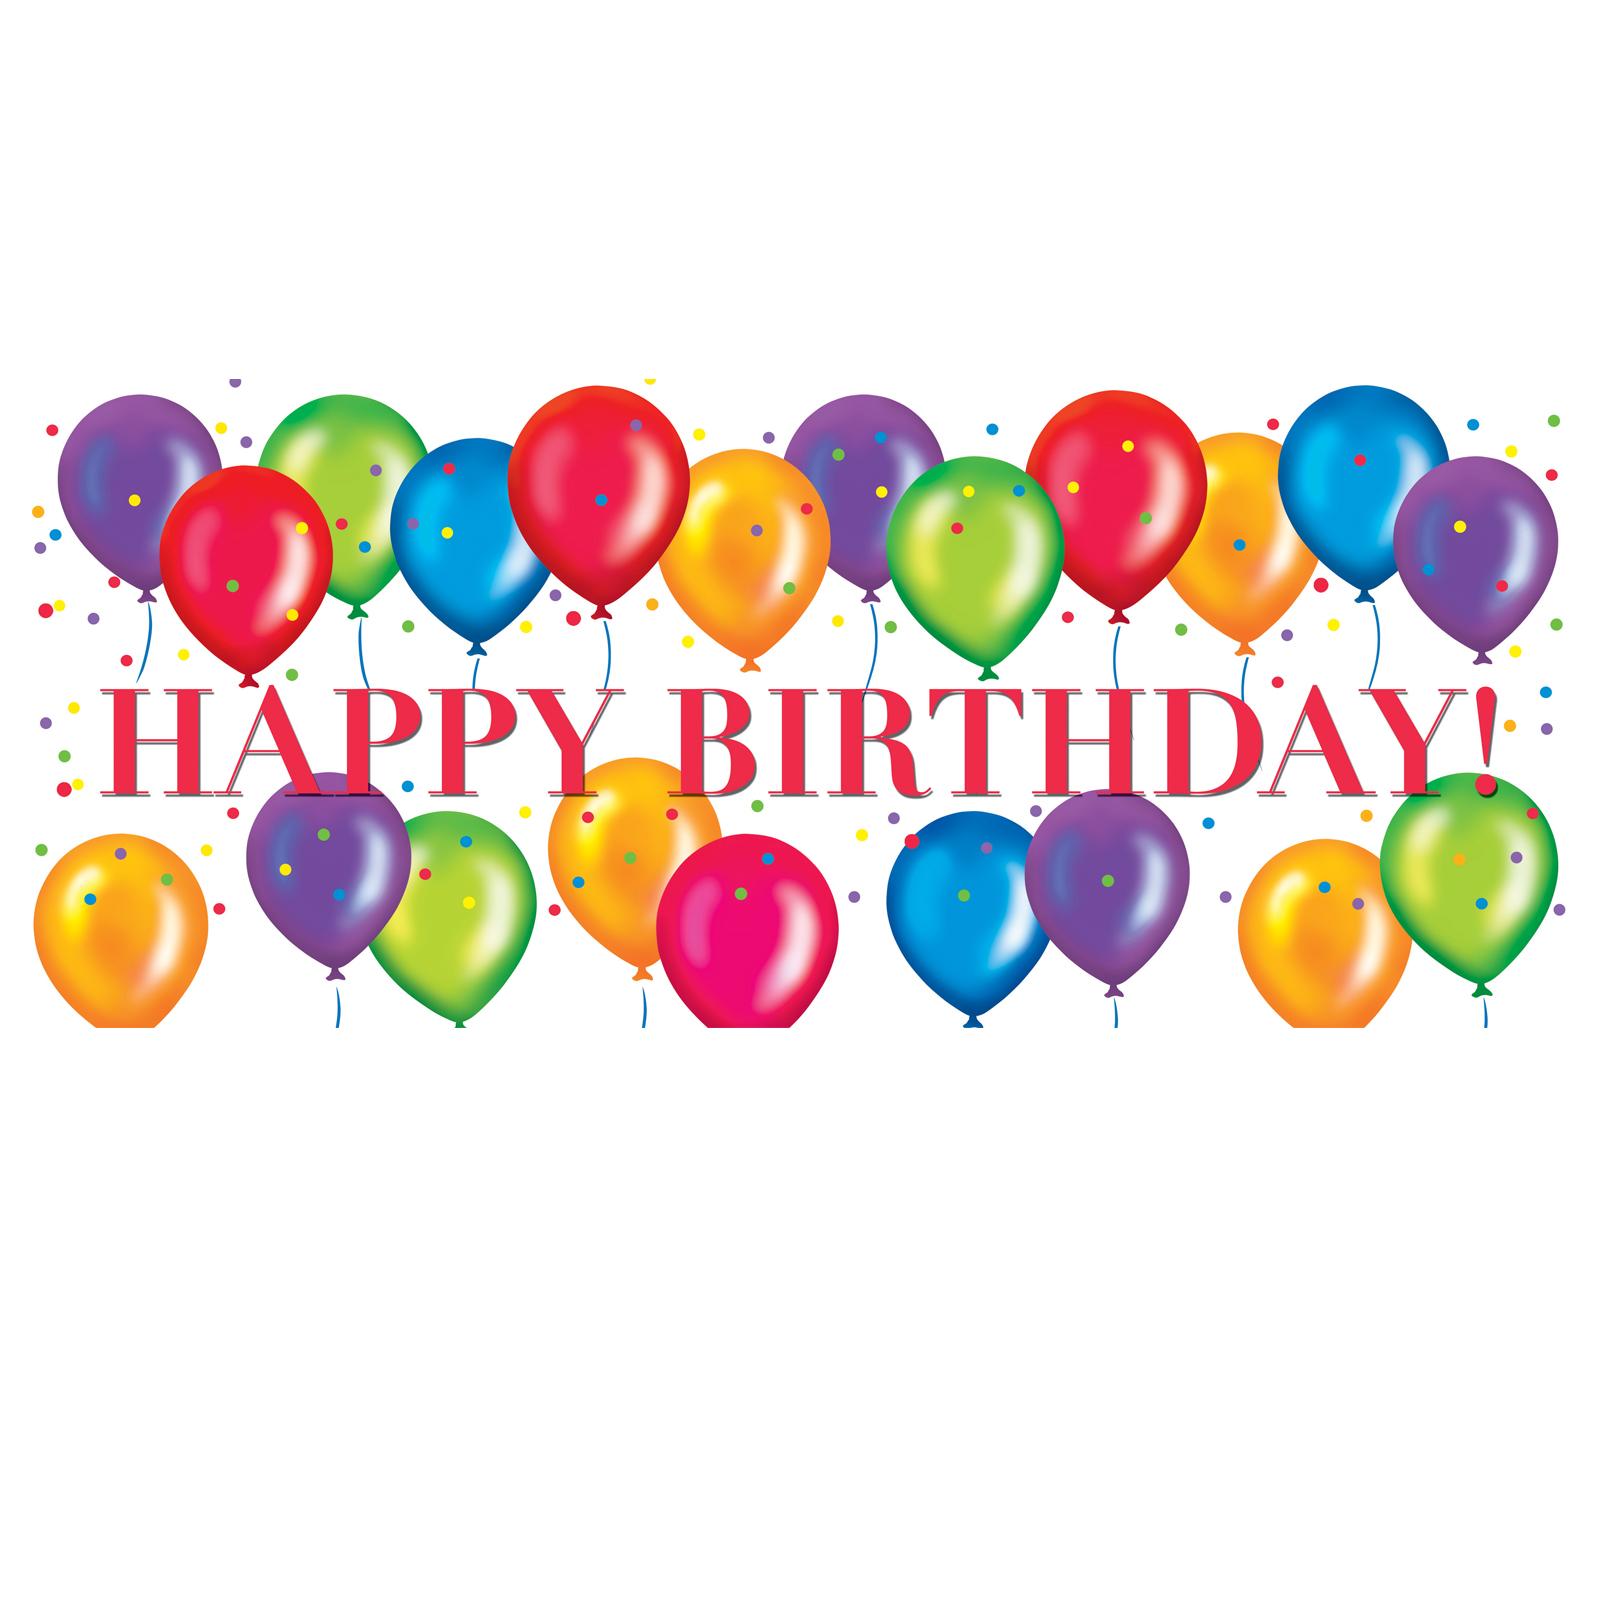 Balloon clipart happy birthday Men For Art Clipart Panda